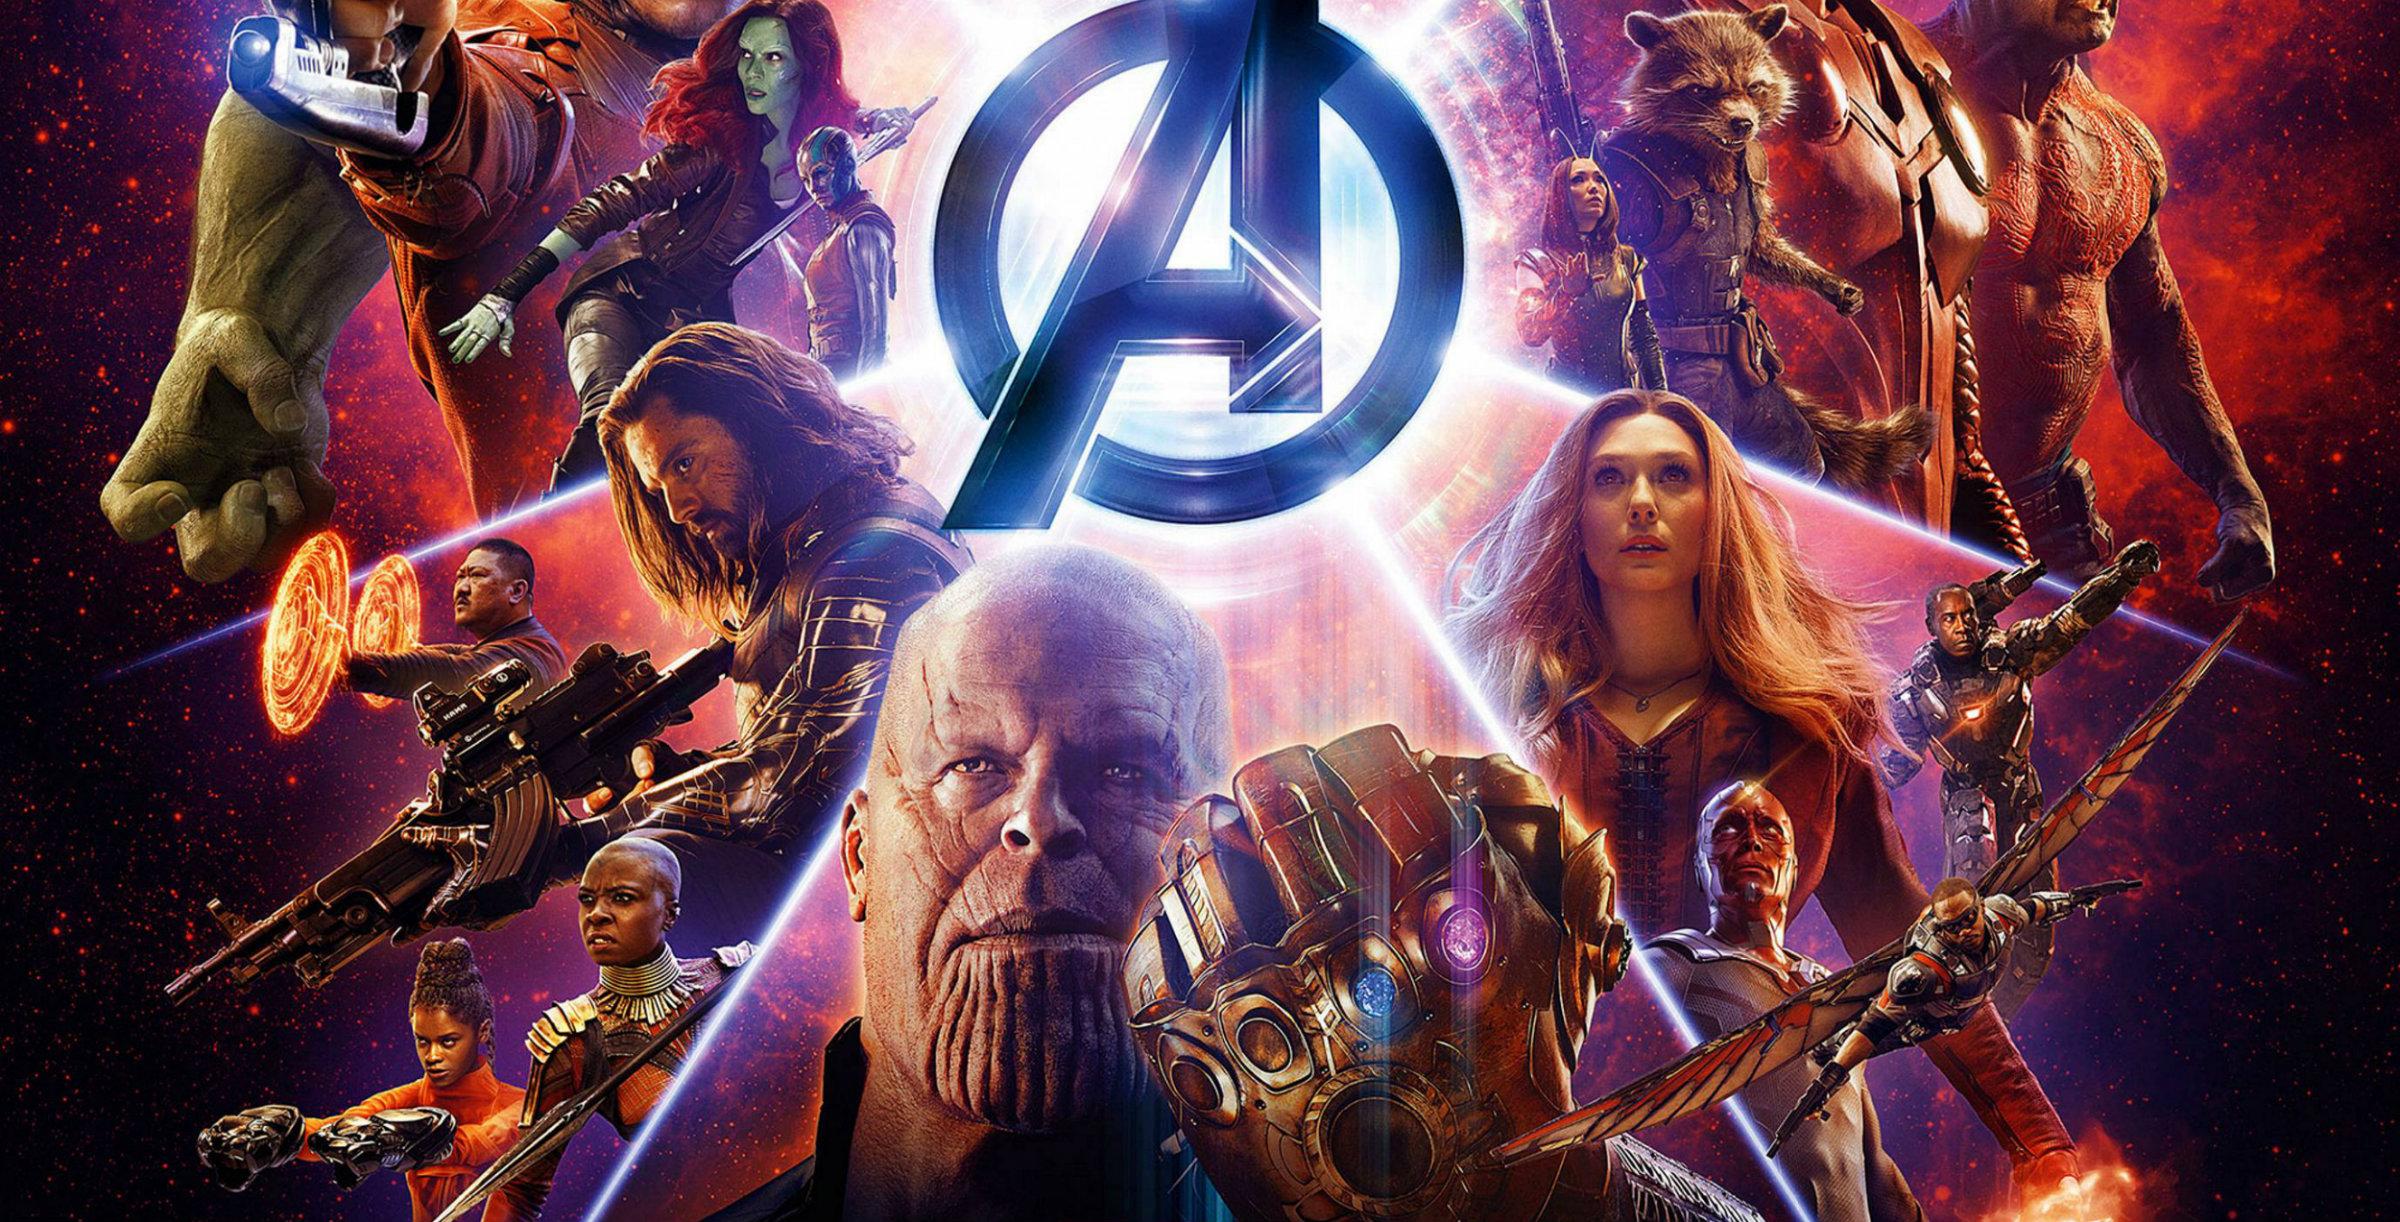 Avengers 3 infinity war deux easter eggs ant man dans l affiche imax brain damaged - Mechant avenger ...